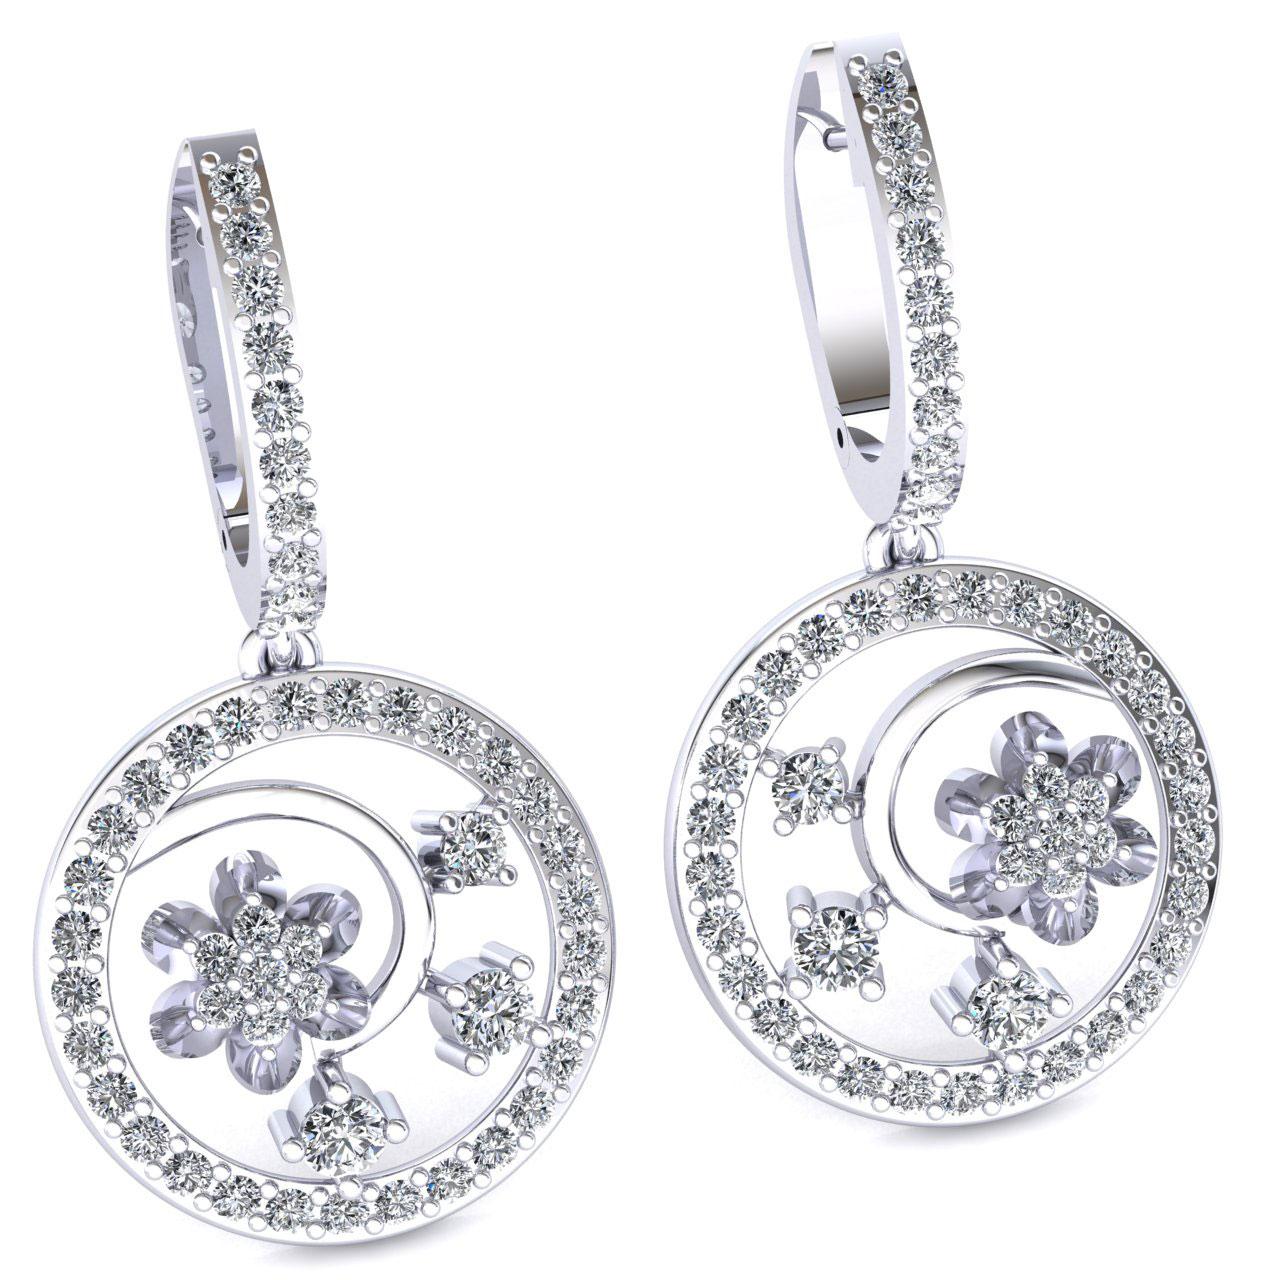 Genuine-1-15carat-Round-Cut-Diamond-Ladies-Flower-Circles-Earrings-14K-Gold thumbnail 9